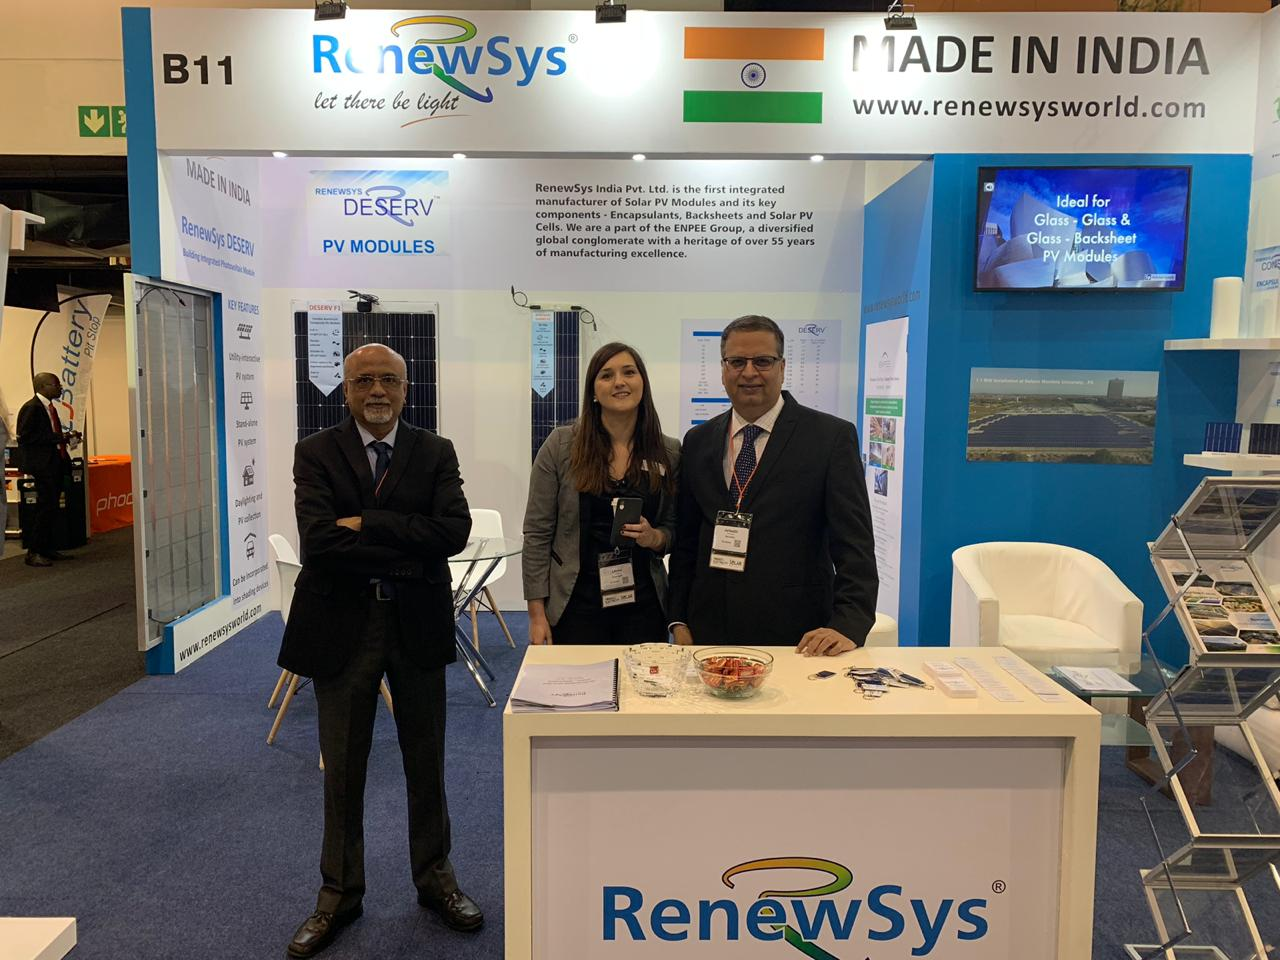 Team RenewSys